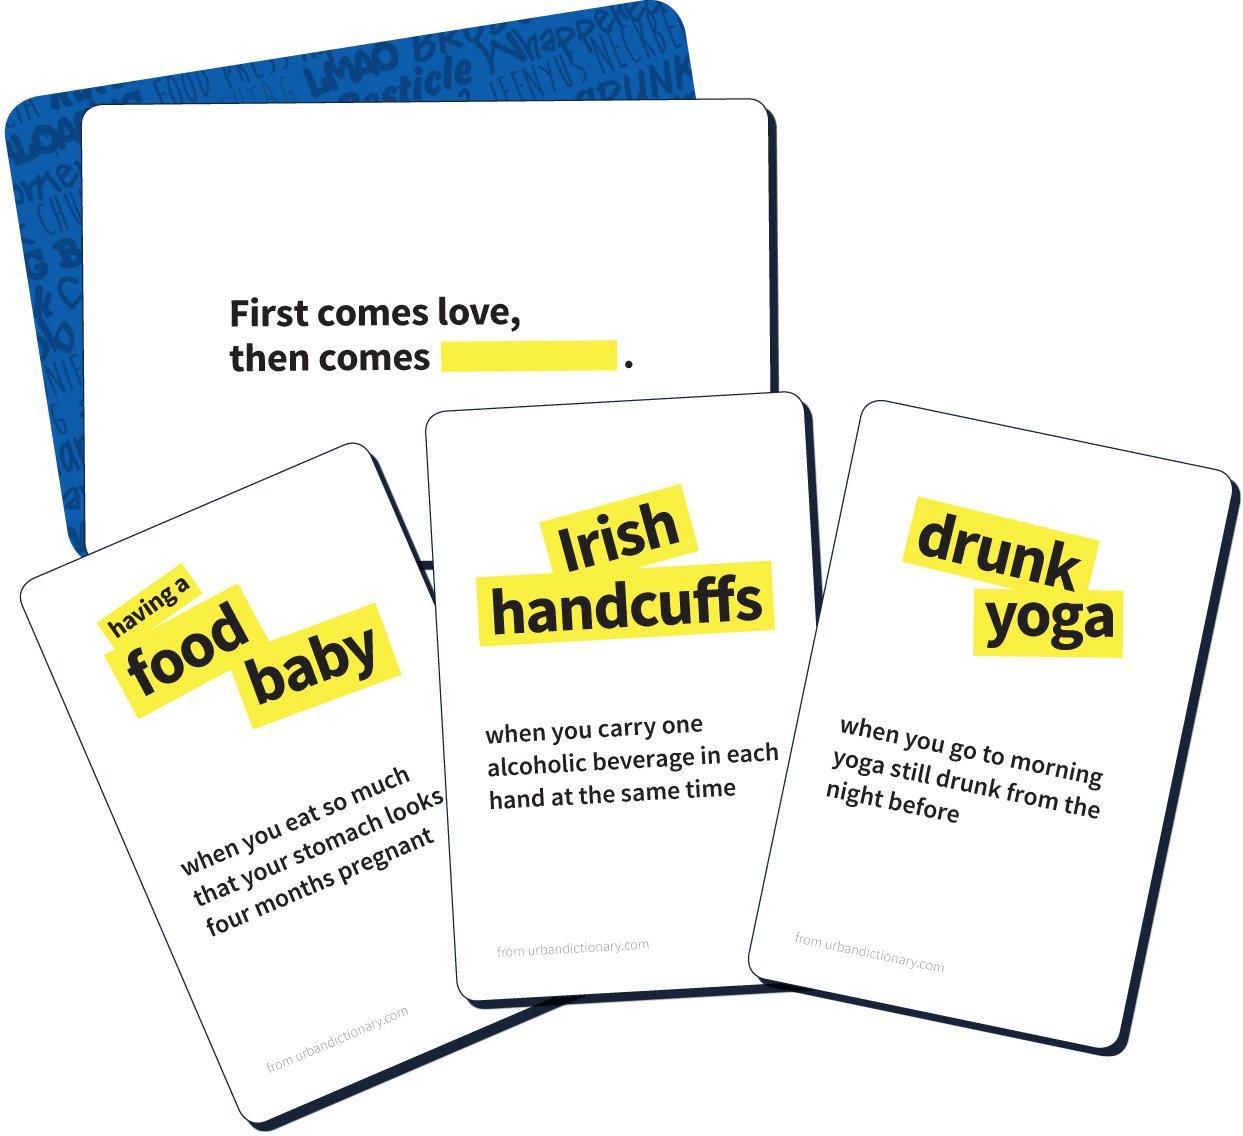 cb10d7a5e7 Buffalo Games Urban Dictionary - The Party Game of Slang Card Game   Amazon.com.au  Toys   Games